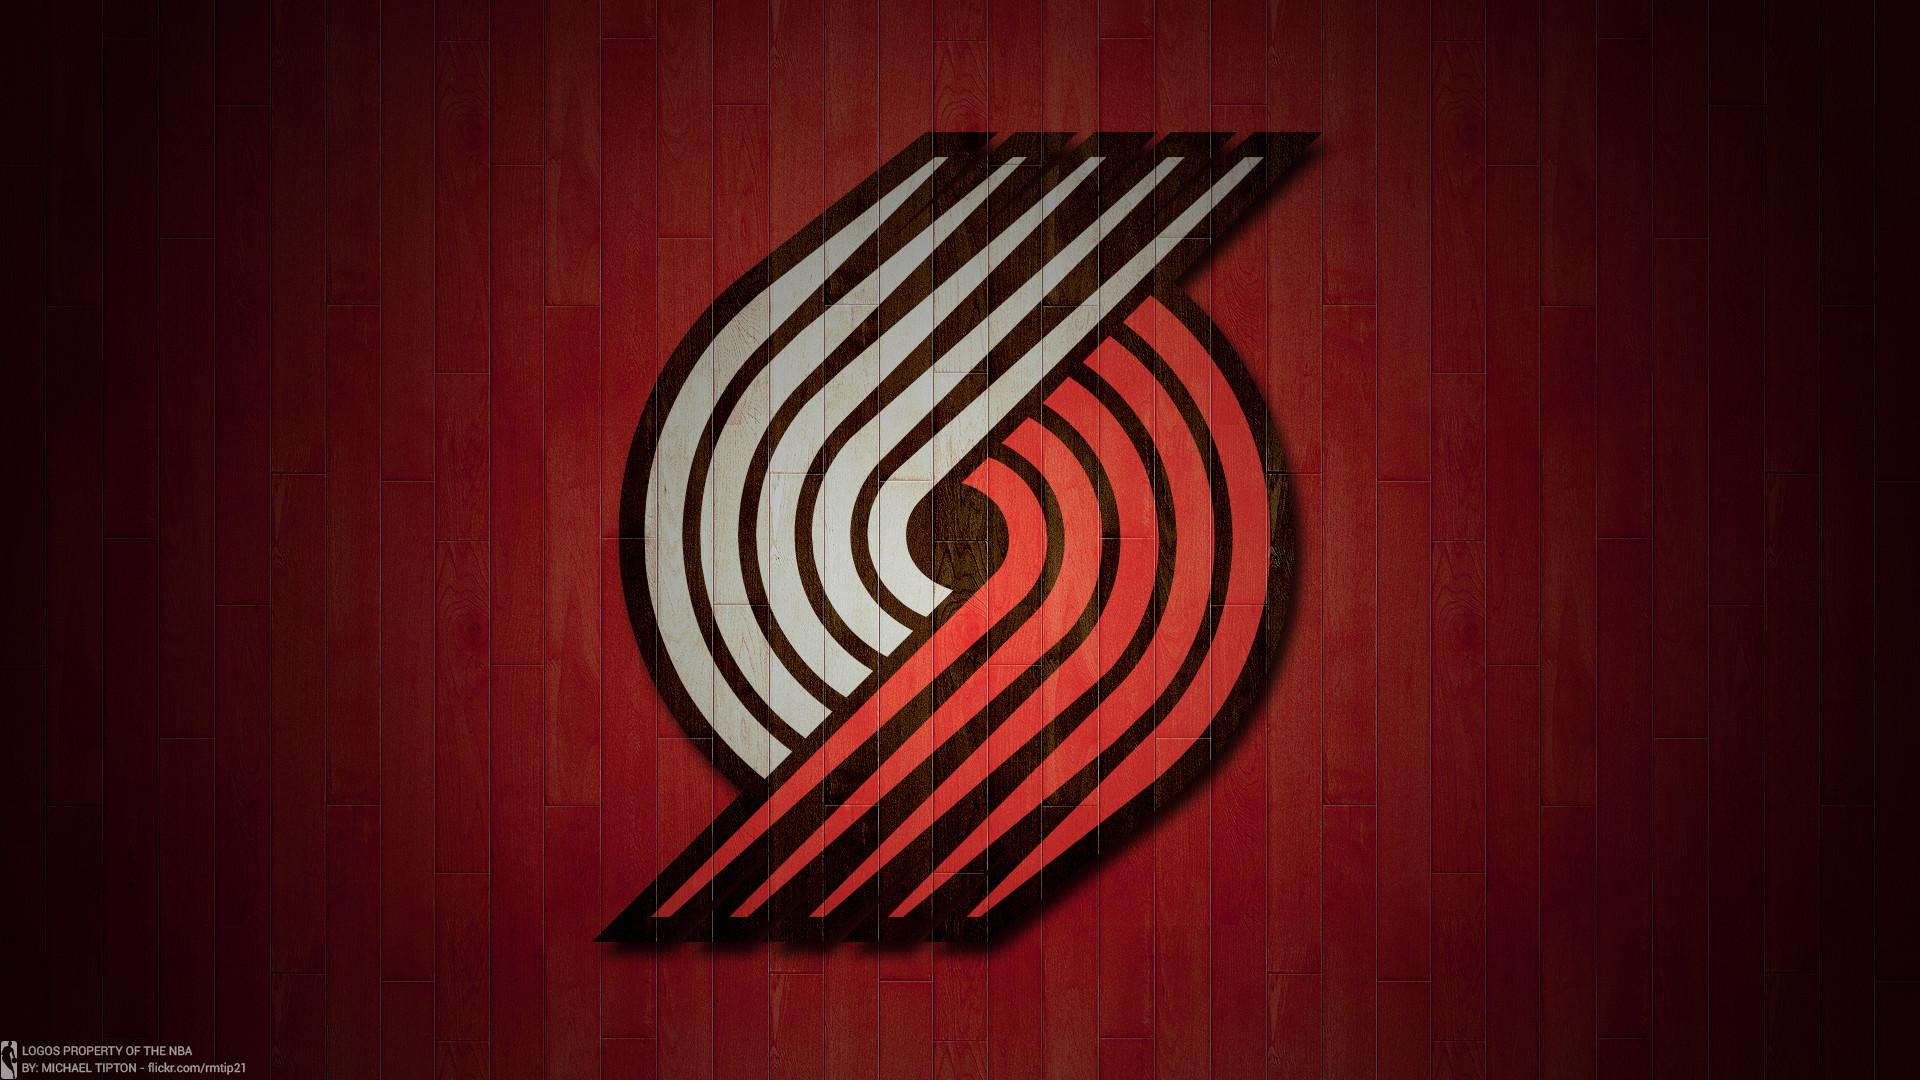 … NBA 2017 Portland Trail Blazers hardwood logo desktop wallpaper